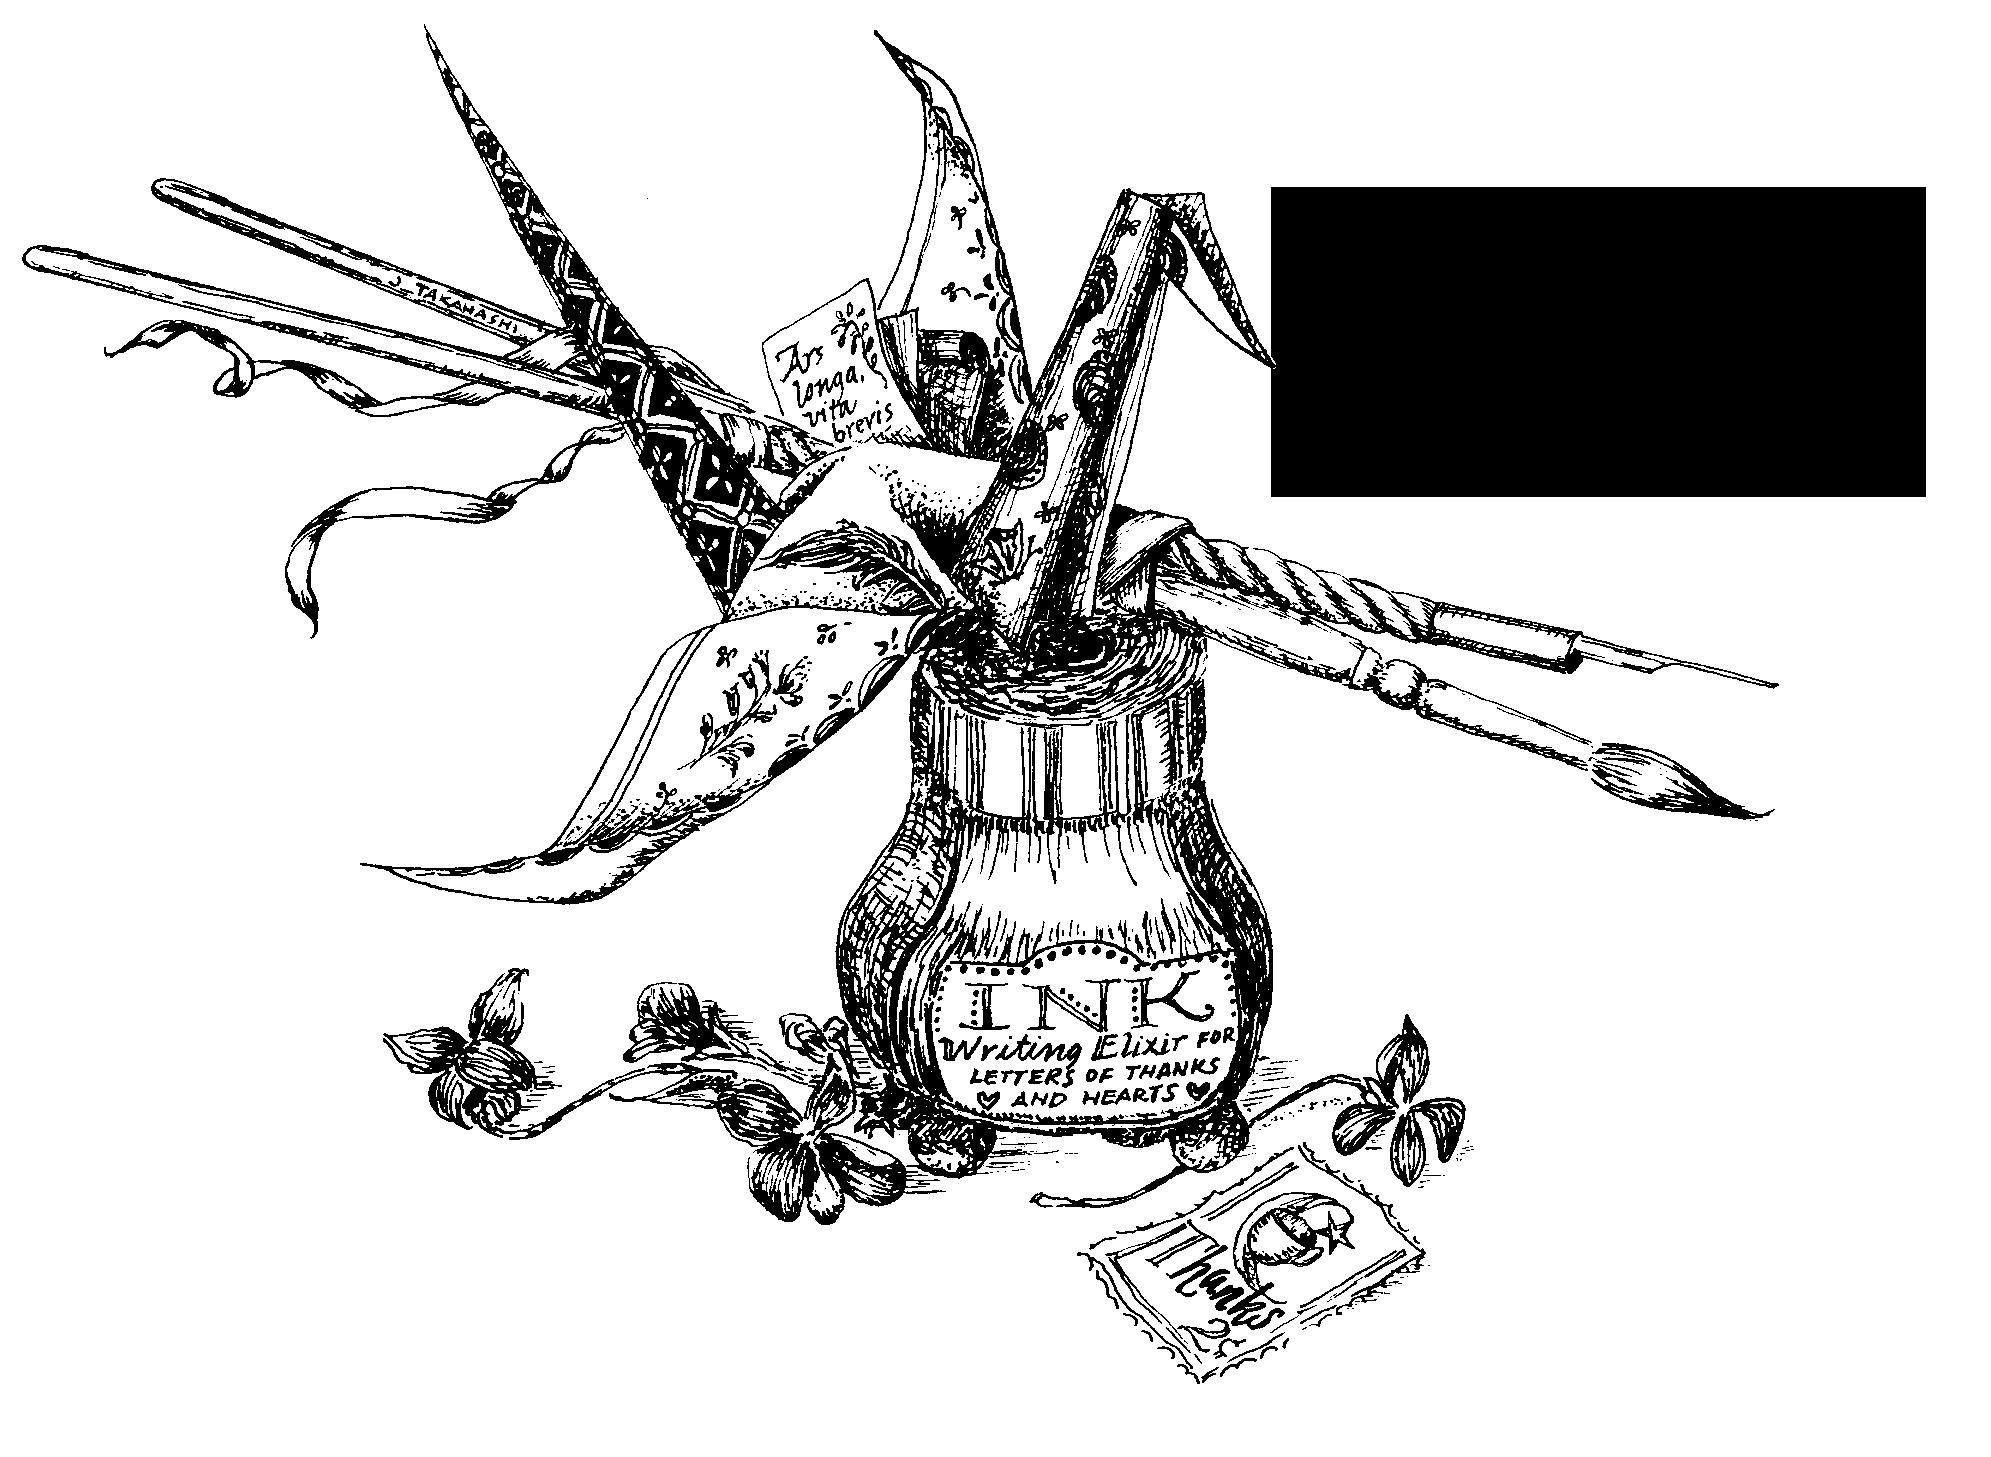 Pen & Ink illustration by Janet Takahashi